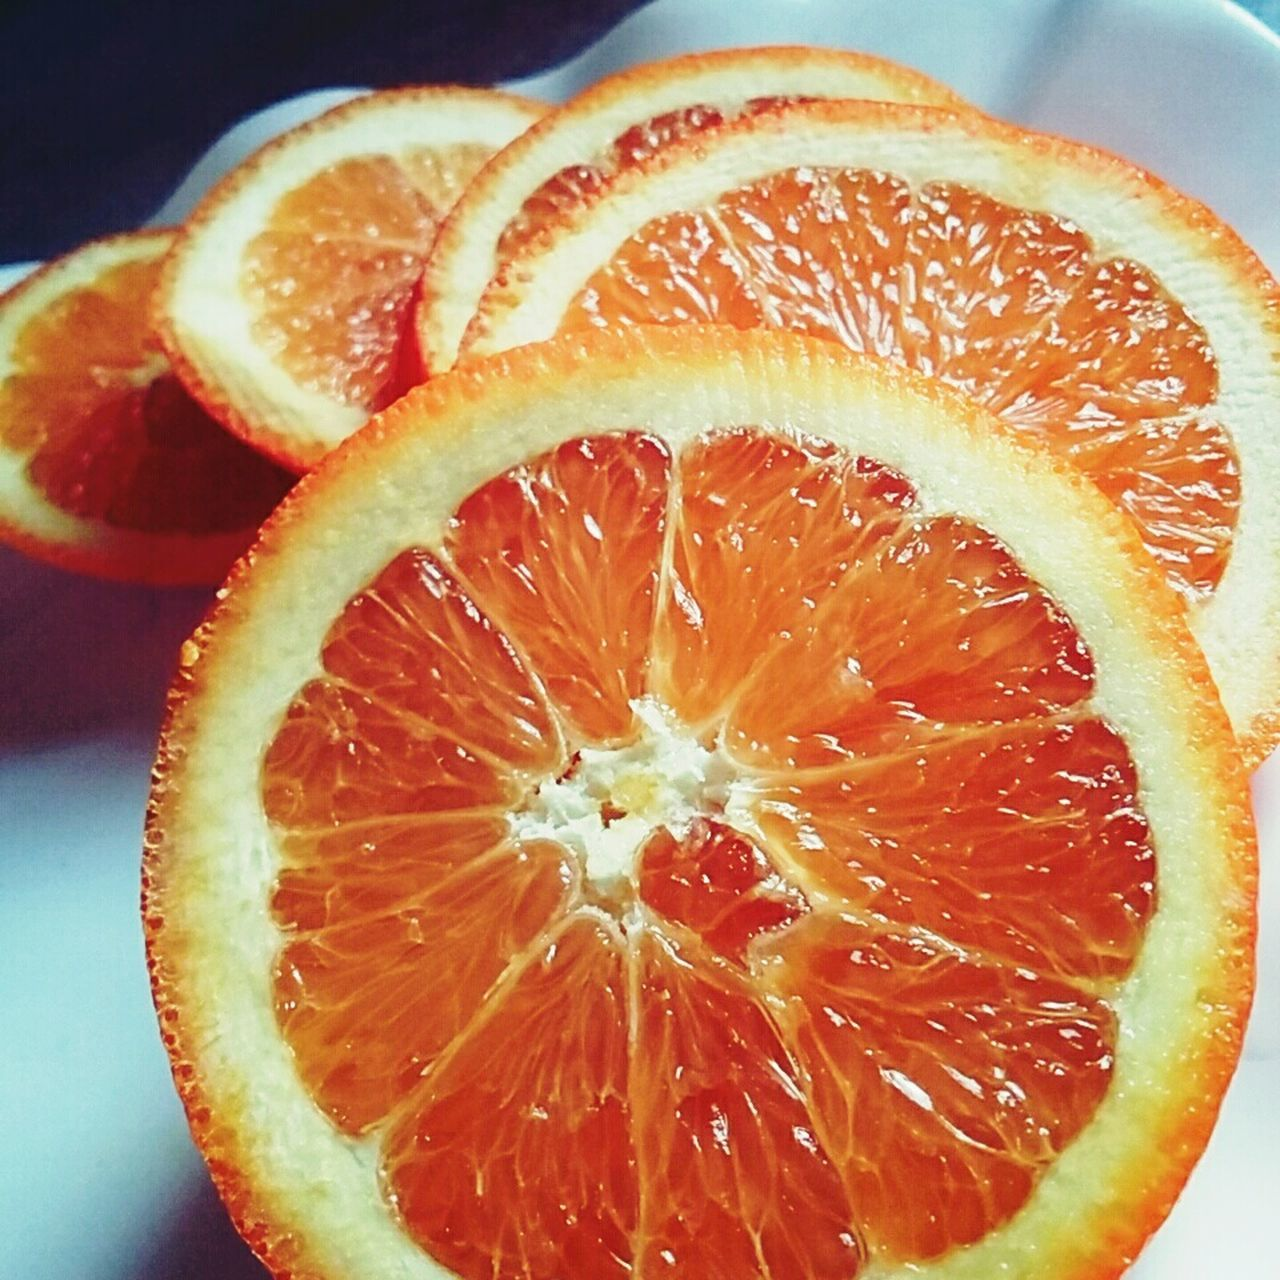 orange Fruit Citrus Fruit Freshness Juicy Orange - Fruit Food And Drink No People Blood Orange Halved Grapefruit Healthy Eating Food